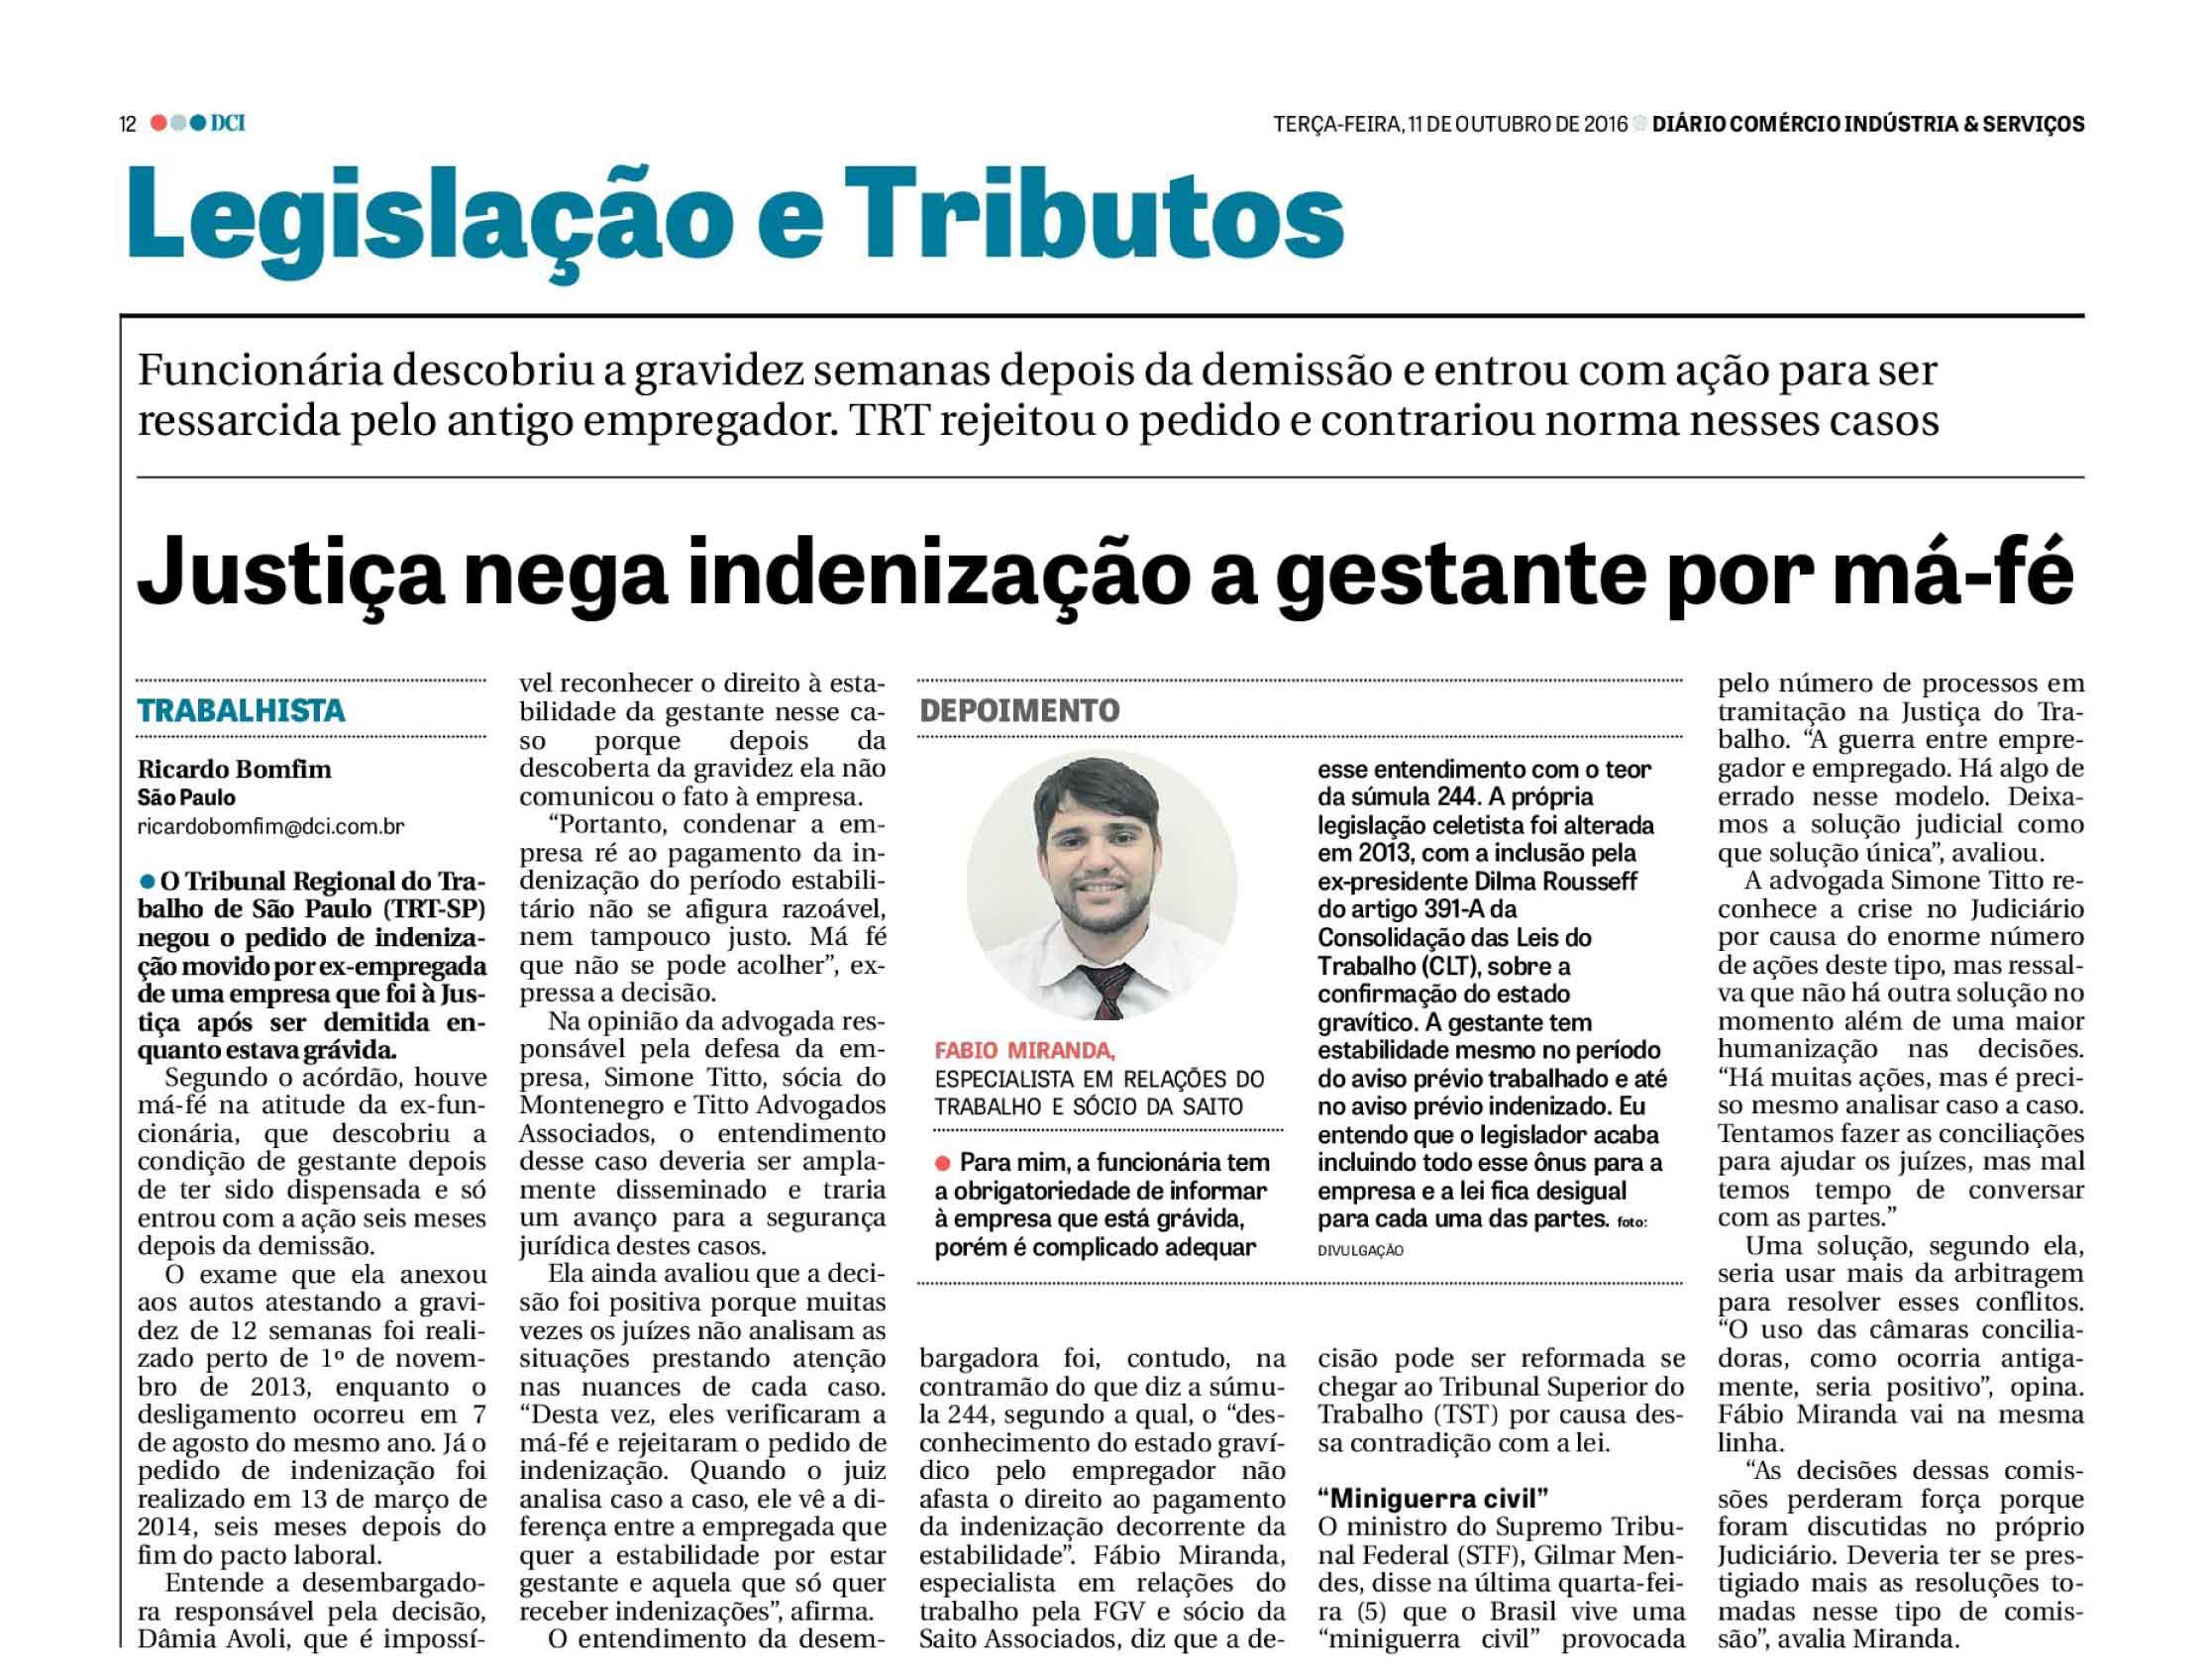 Entrevista do advogado Fabio Miranda para o jornal DCI